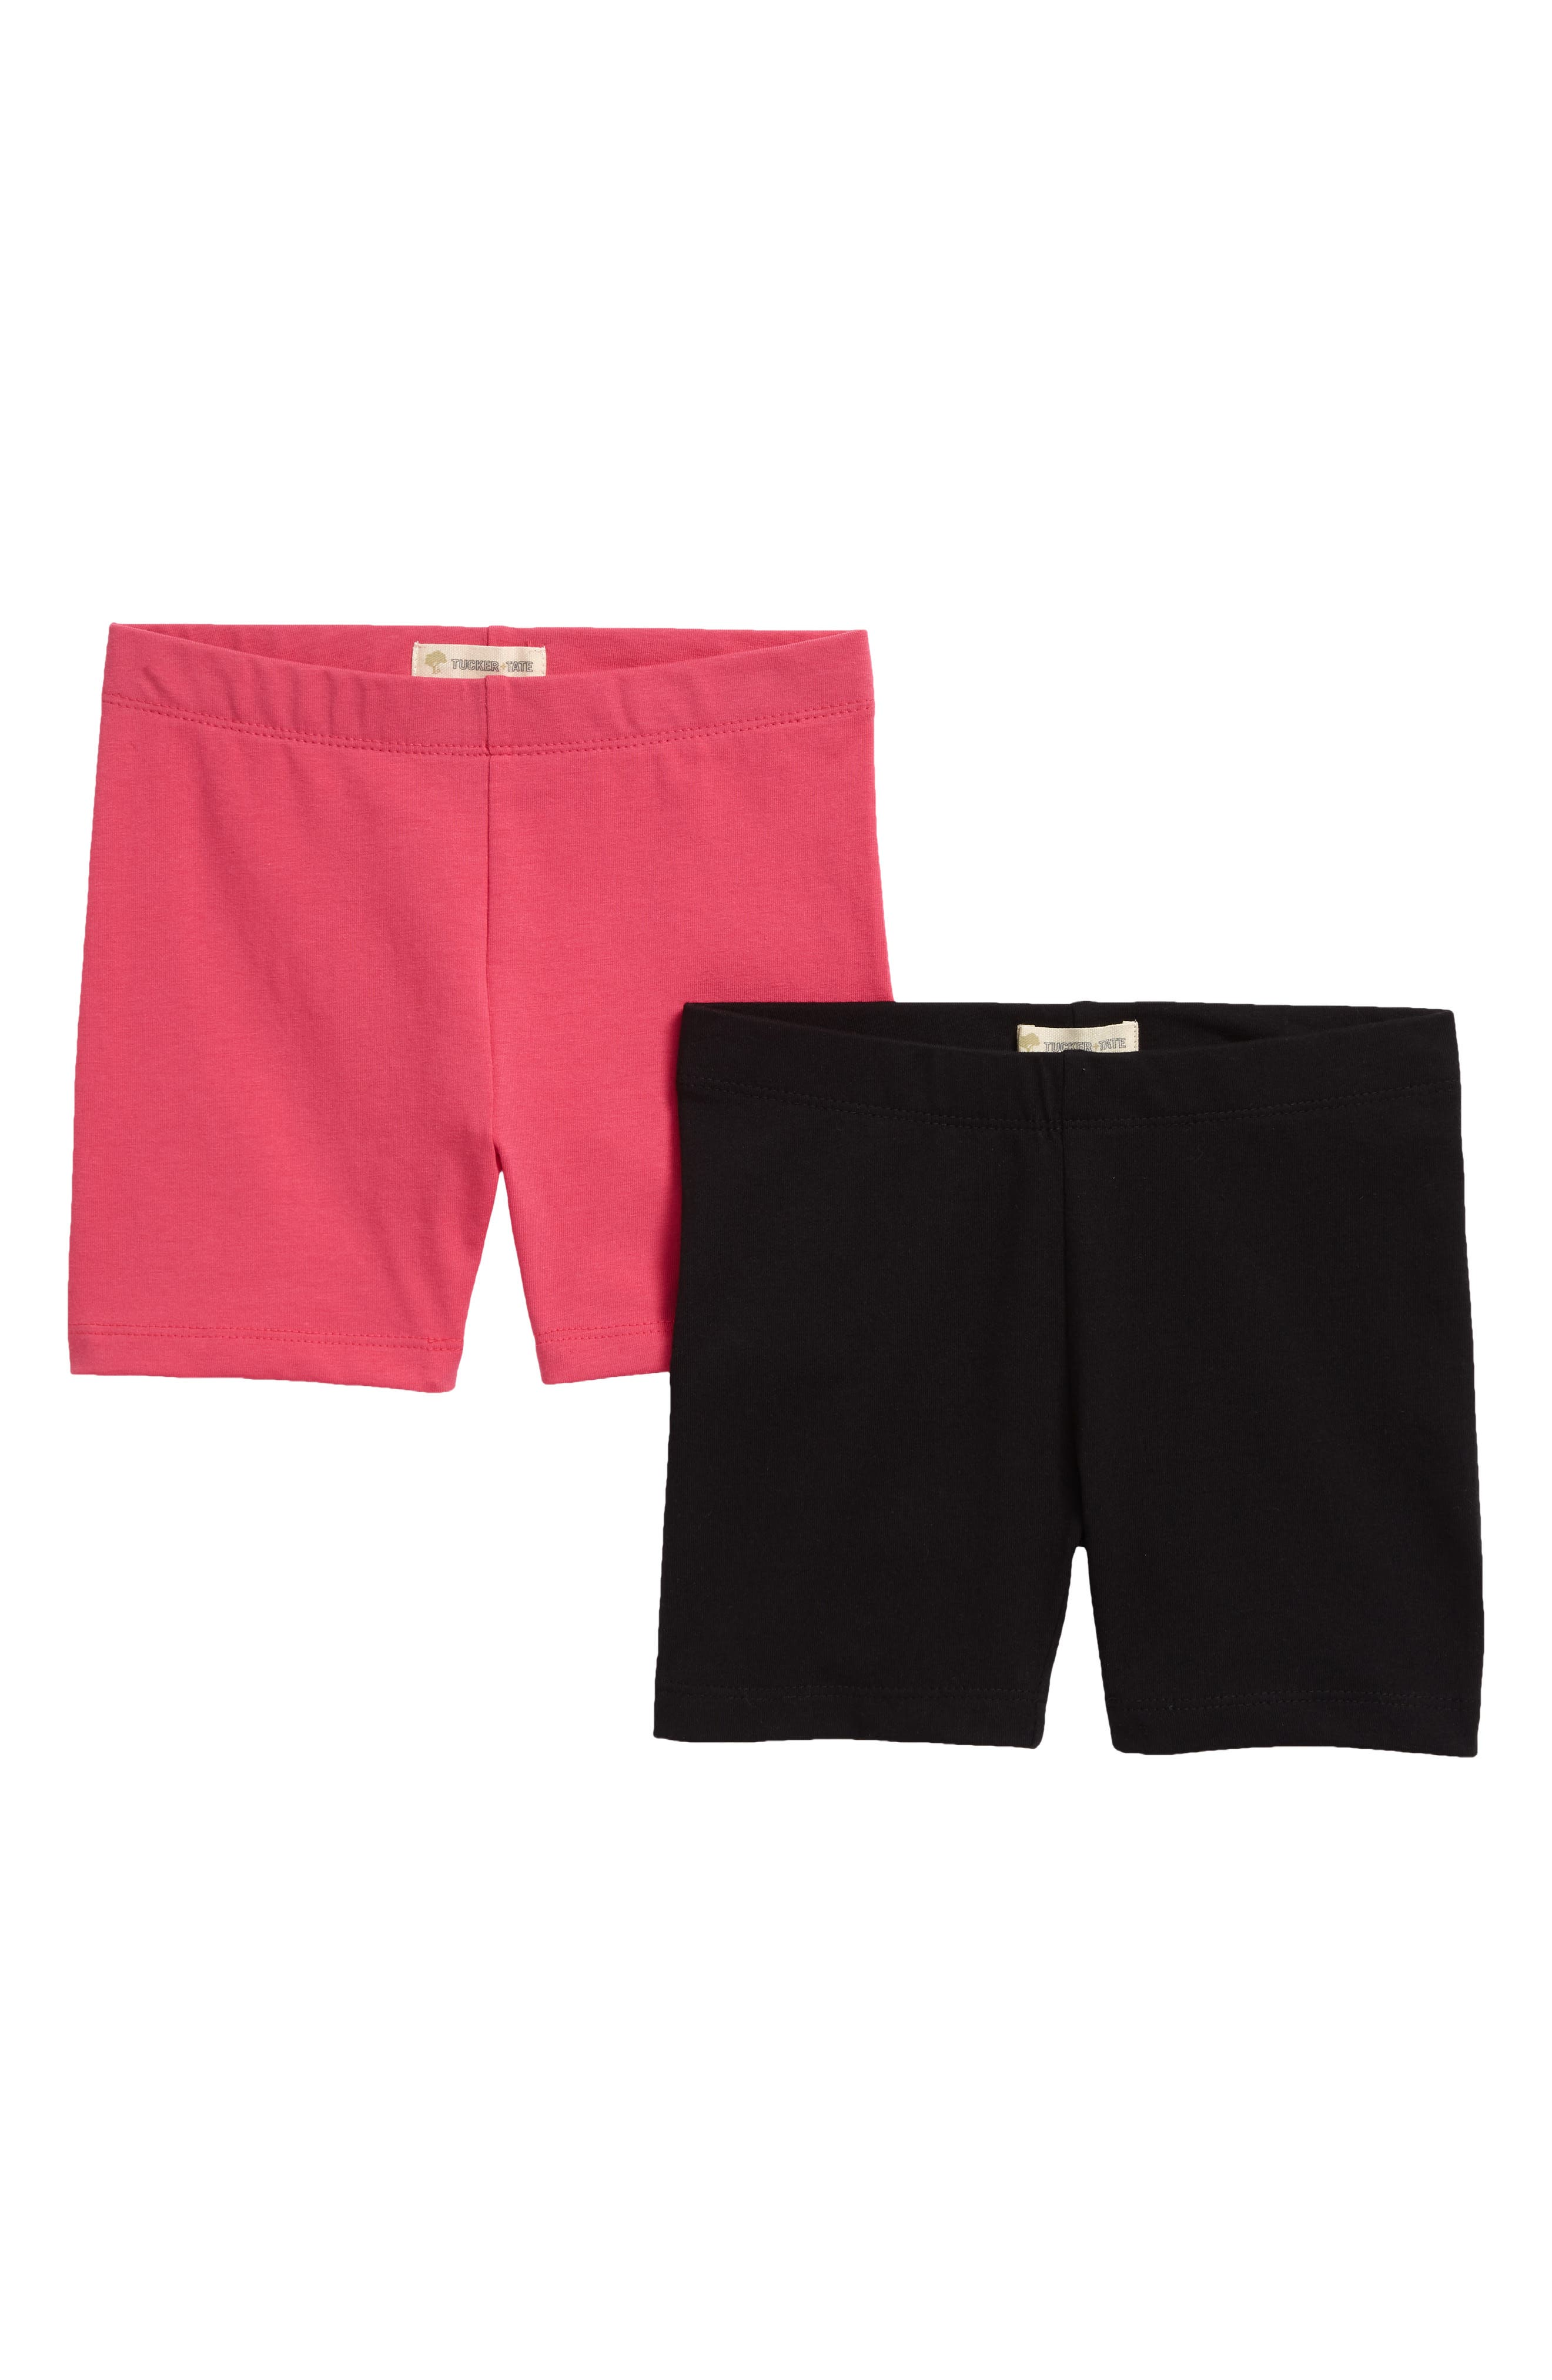 Image of Tucker + Tate Bike Shorts - Set of 2